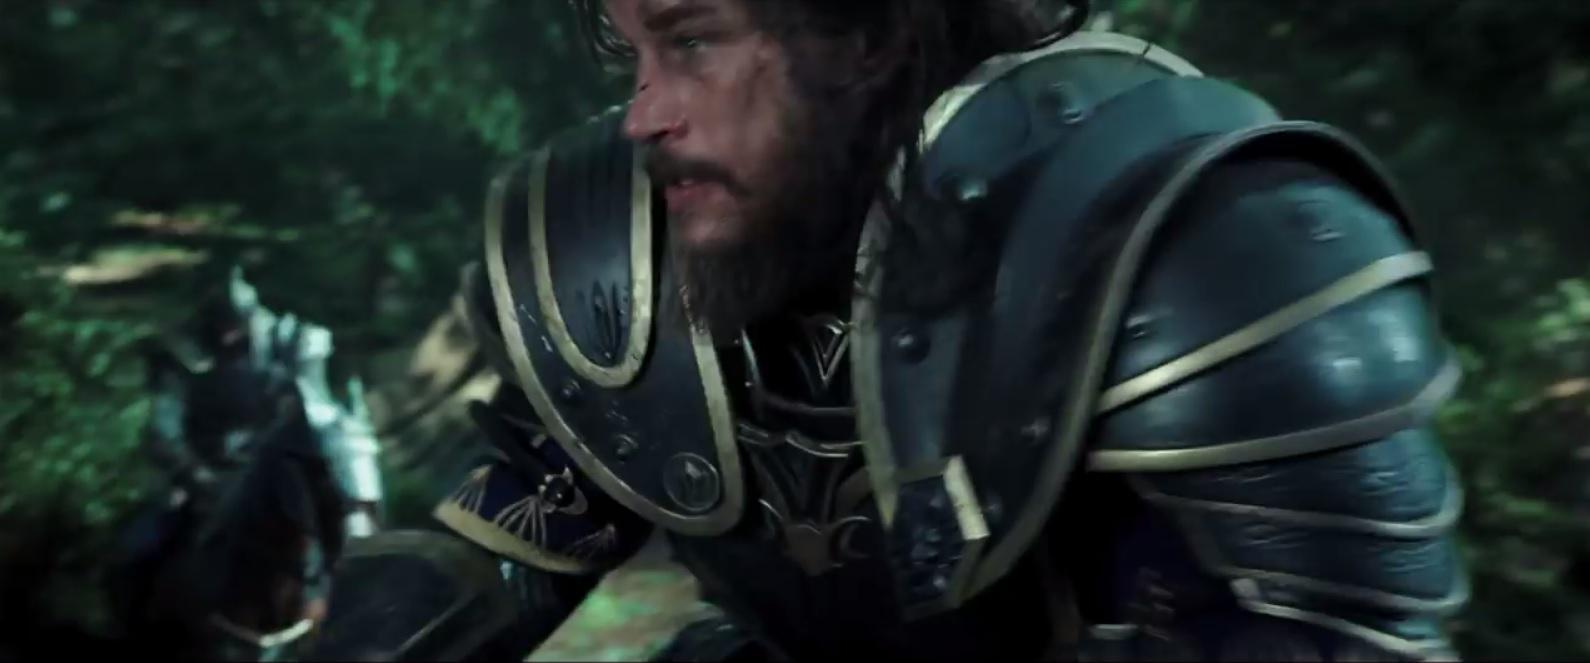 Warcraft Fragmanı 31